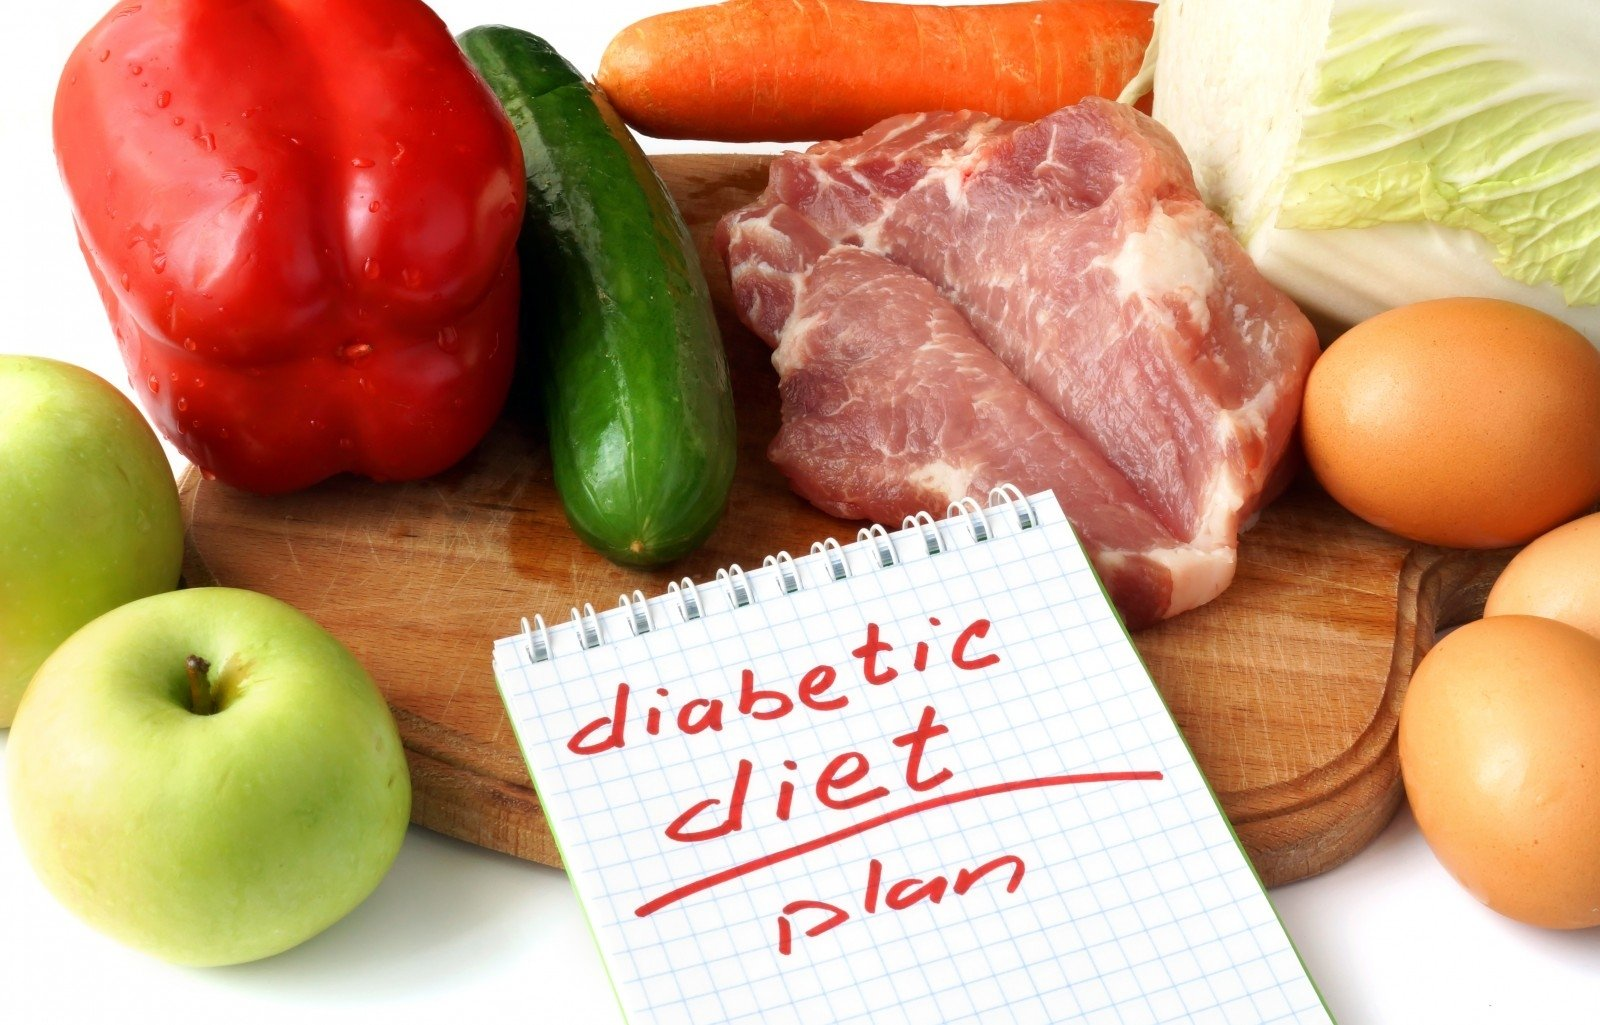 dieta sergant 2 tipo cukriniu diabetu, sergančiu hipertenzija)